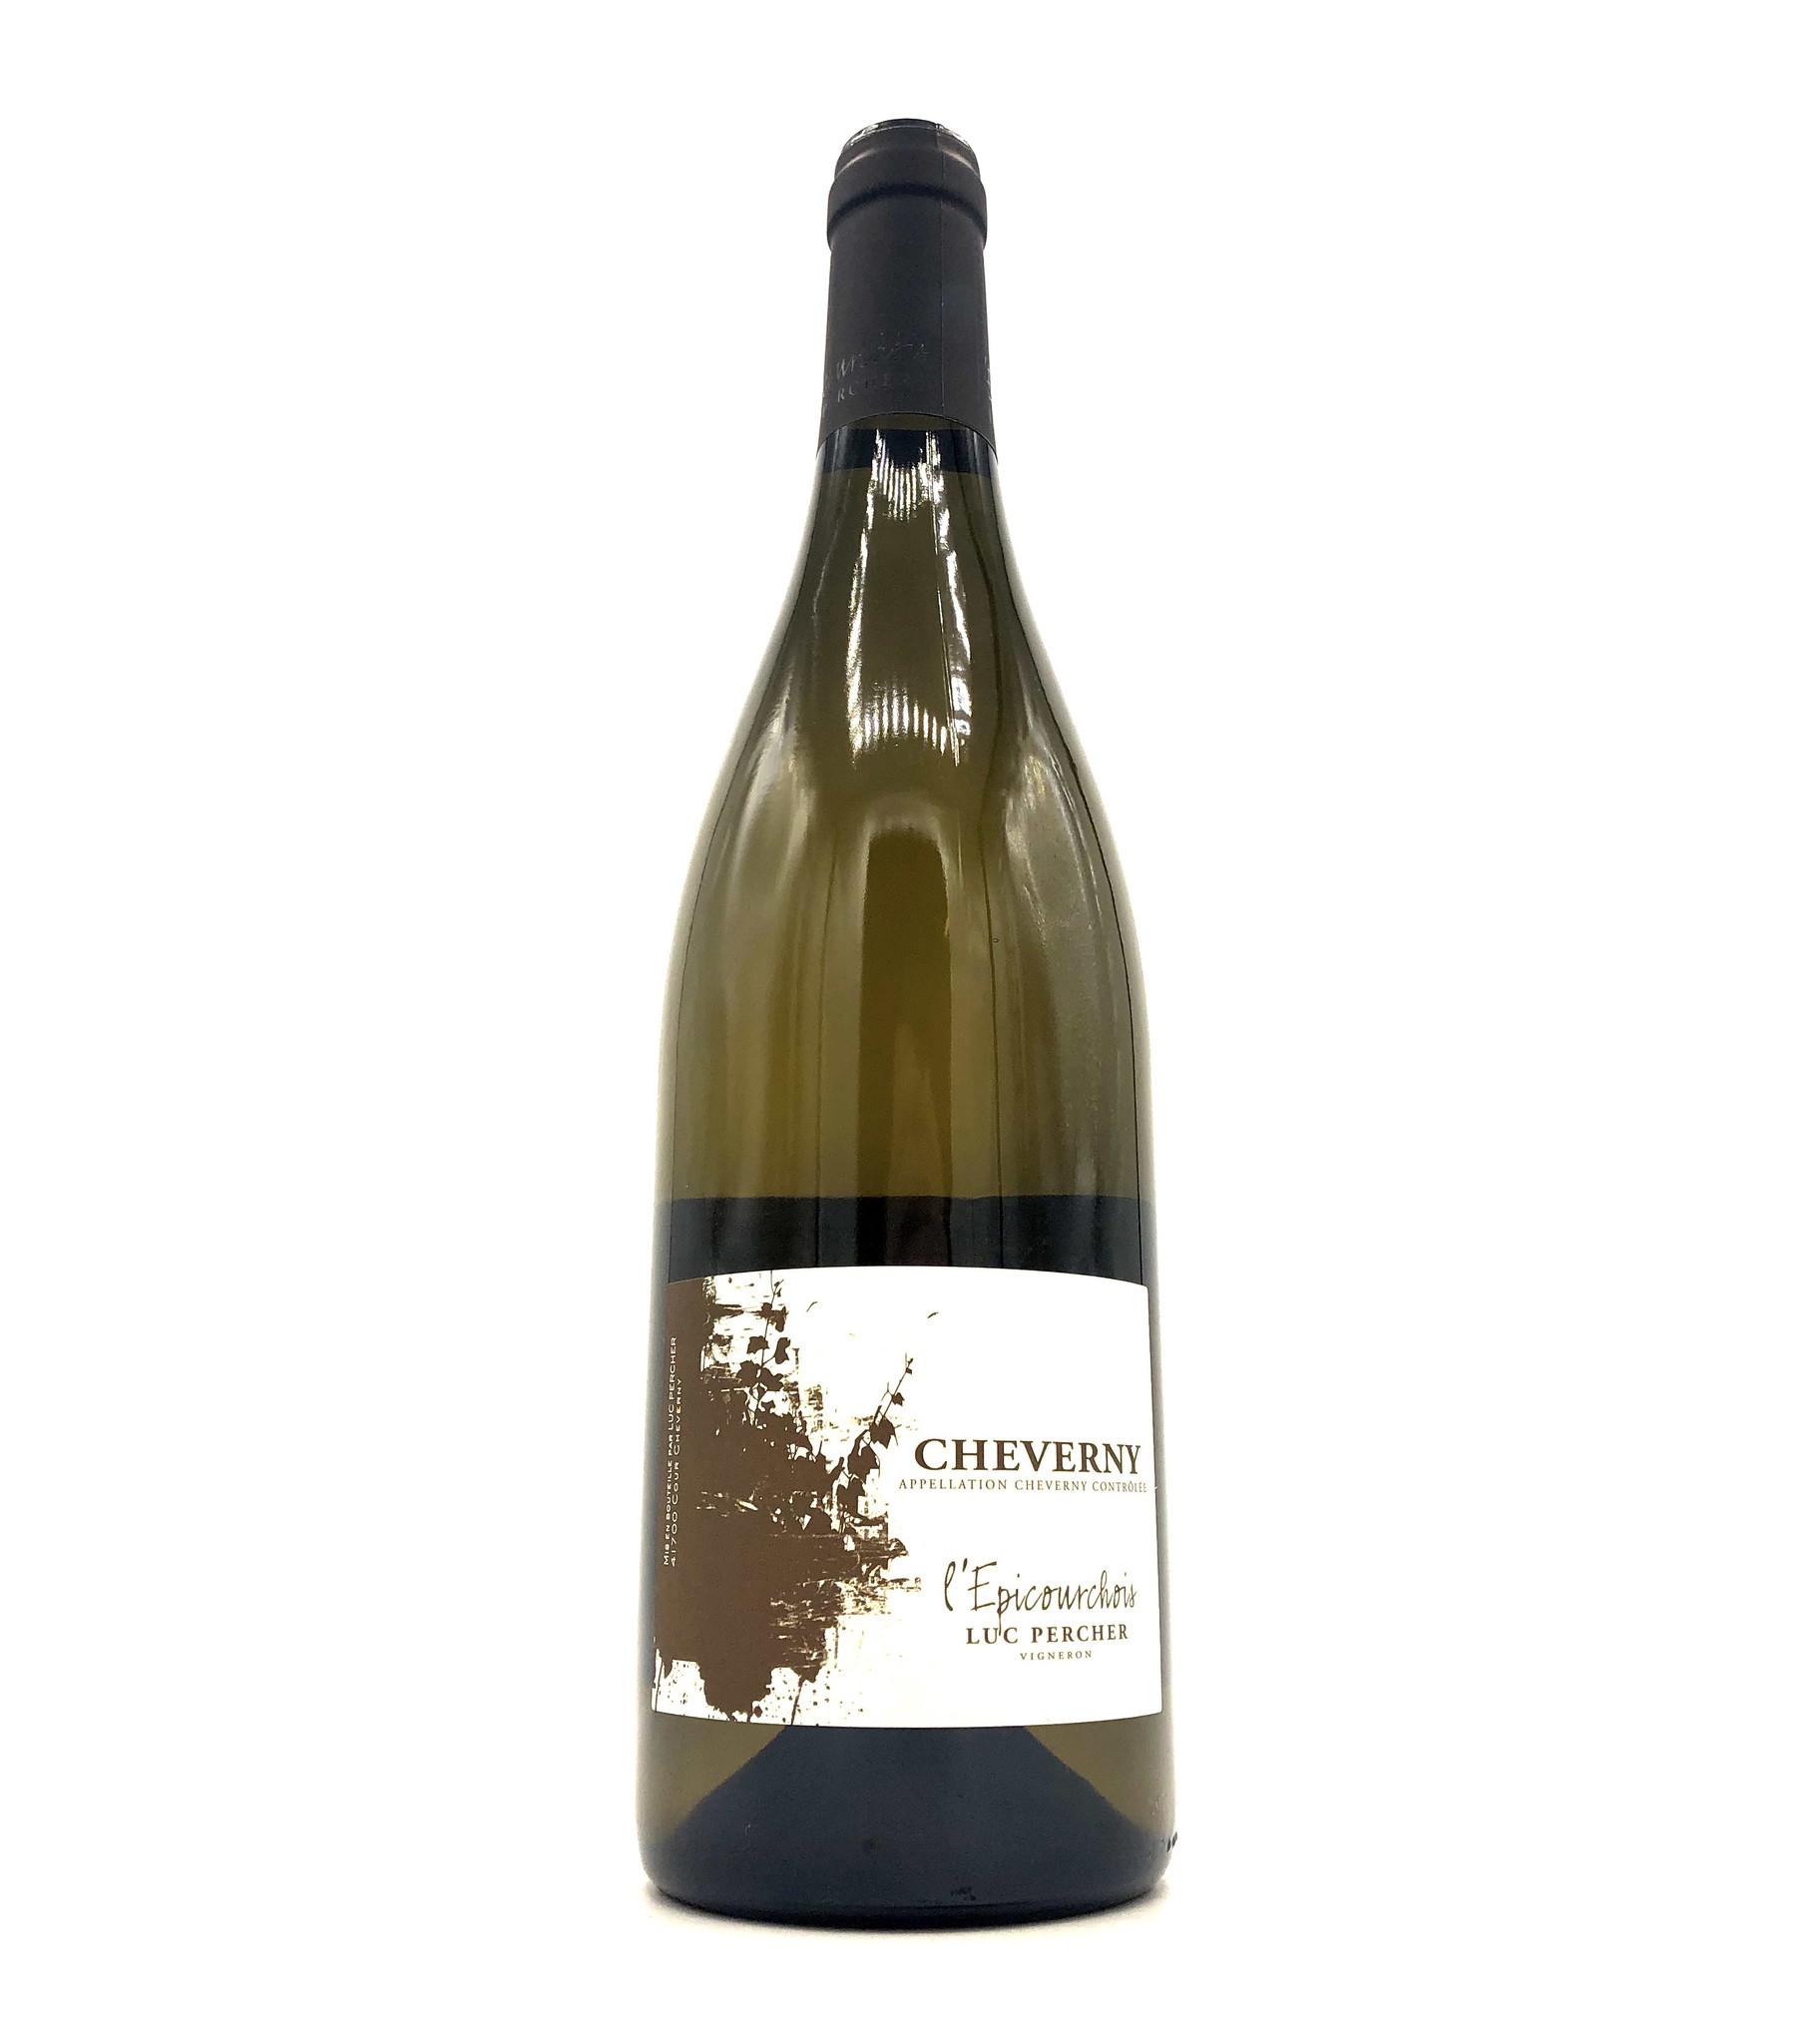 Cheverny Blanc 2018 L'Epicourchois